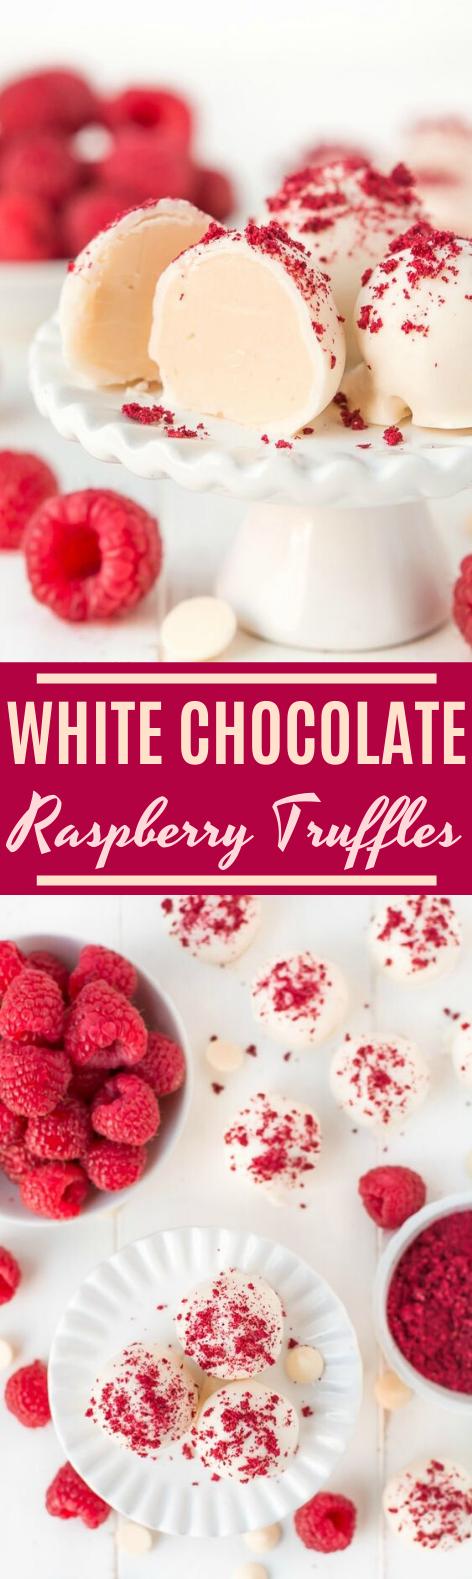 White Chocolate Raspberry Truffles #desserts #chocolate #candy #christmas #nobake